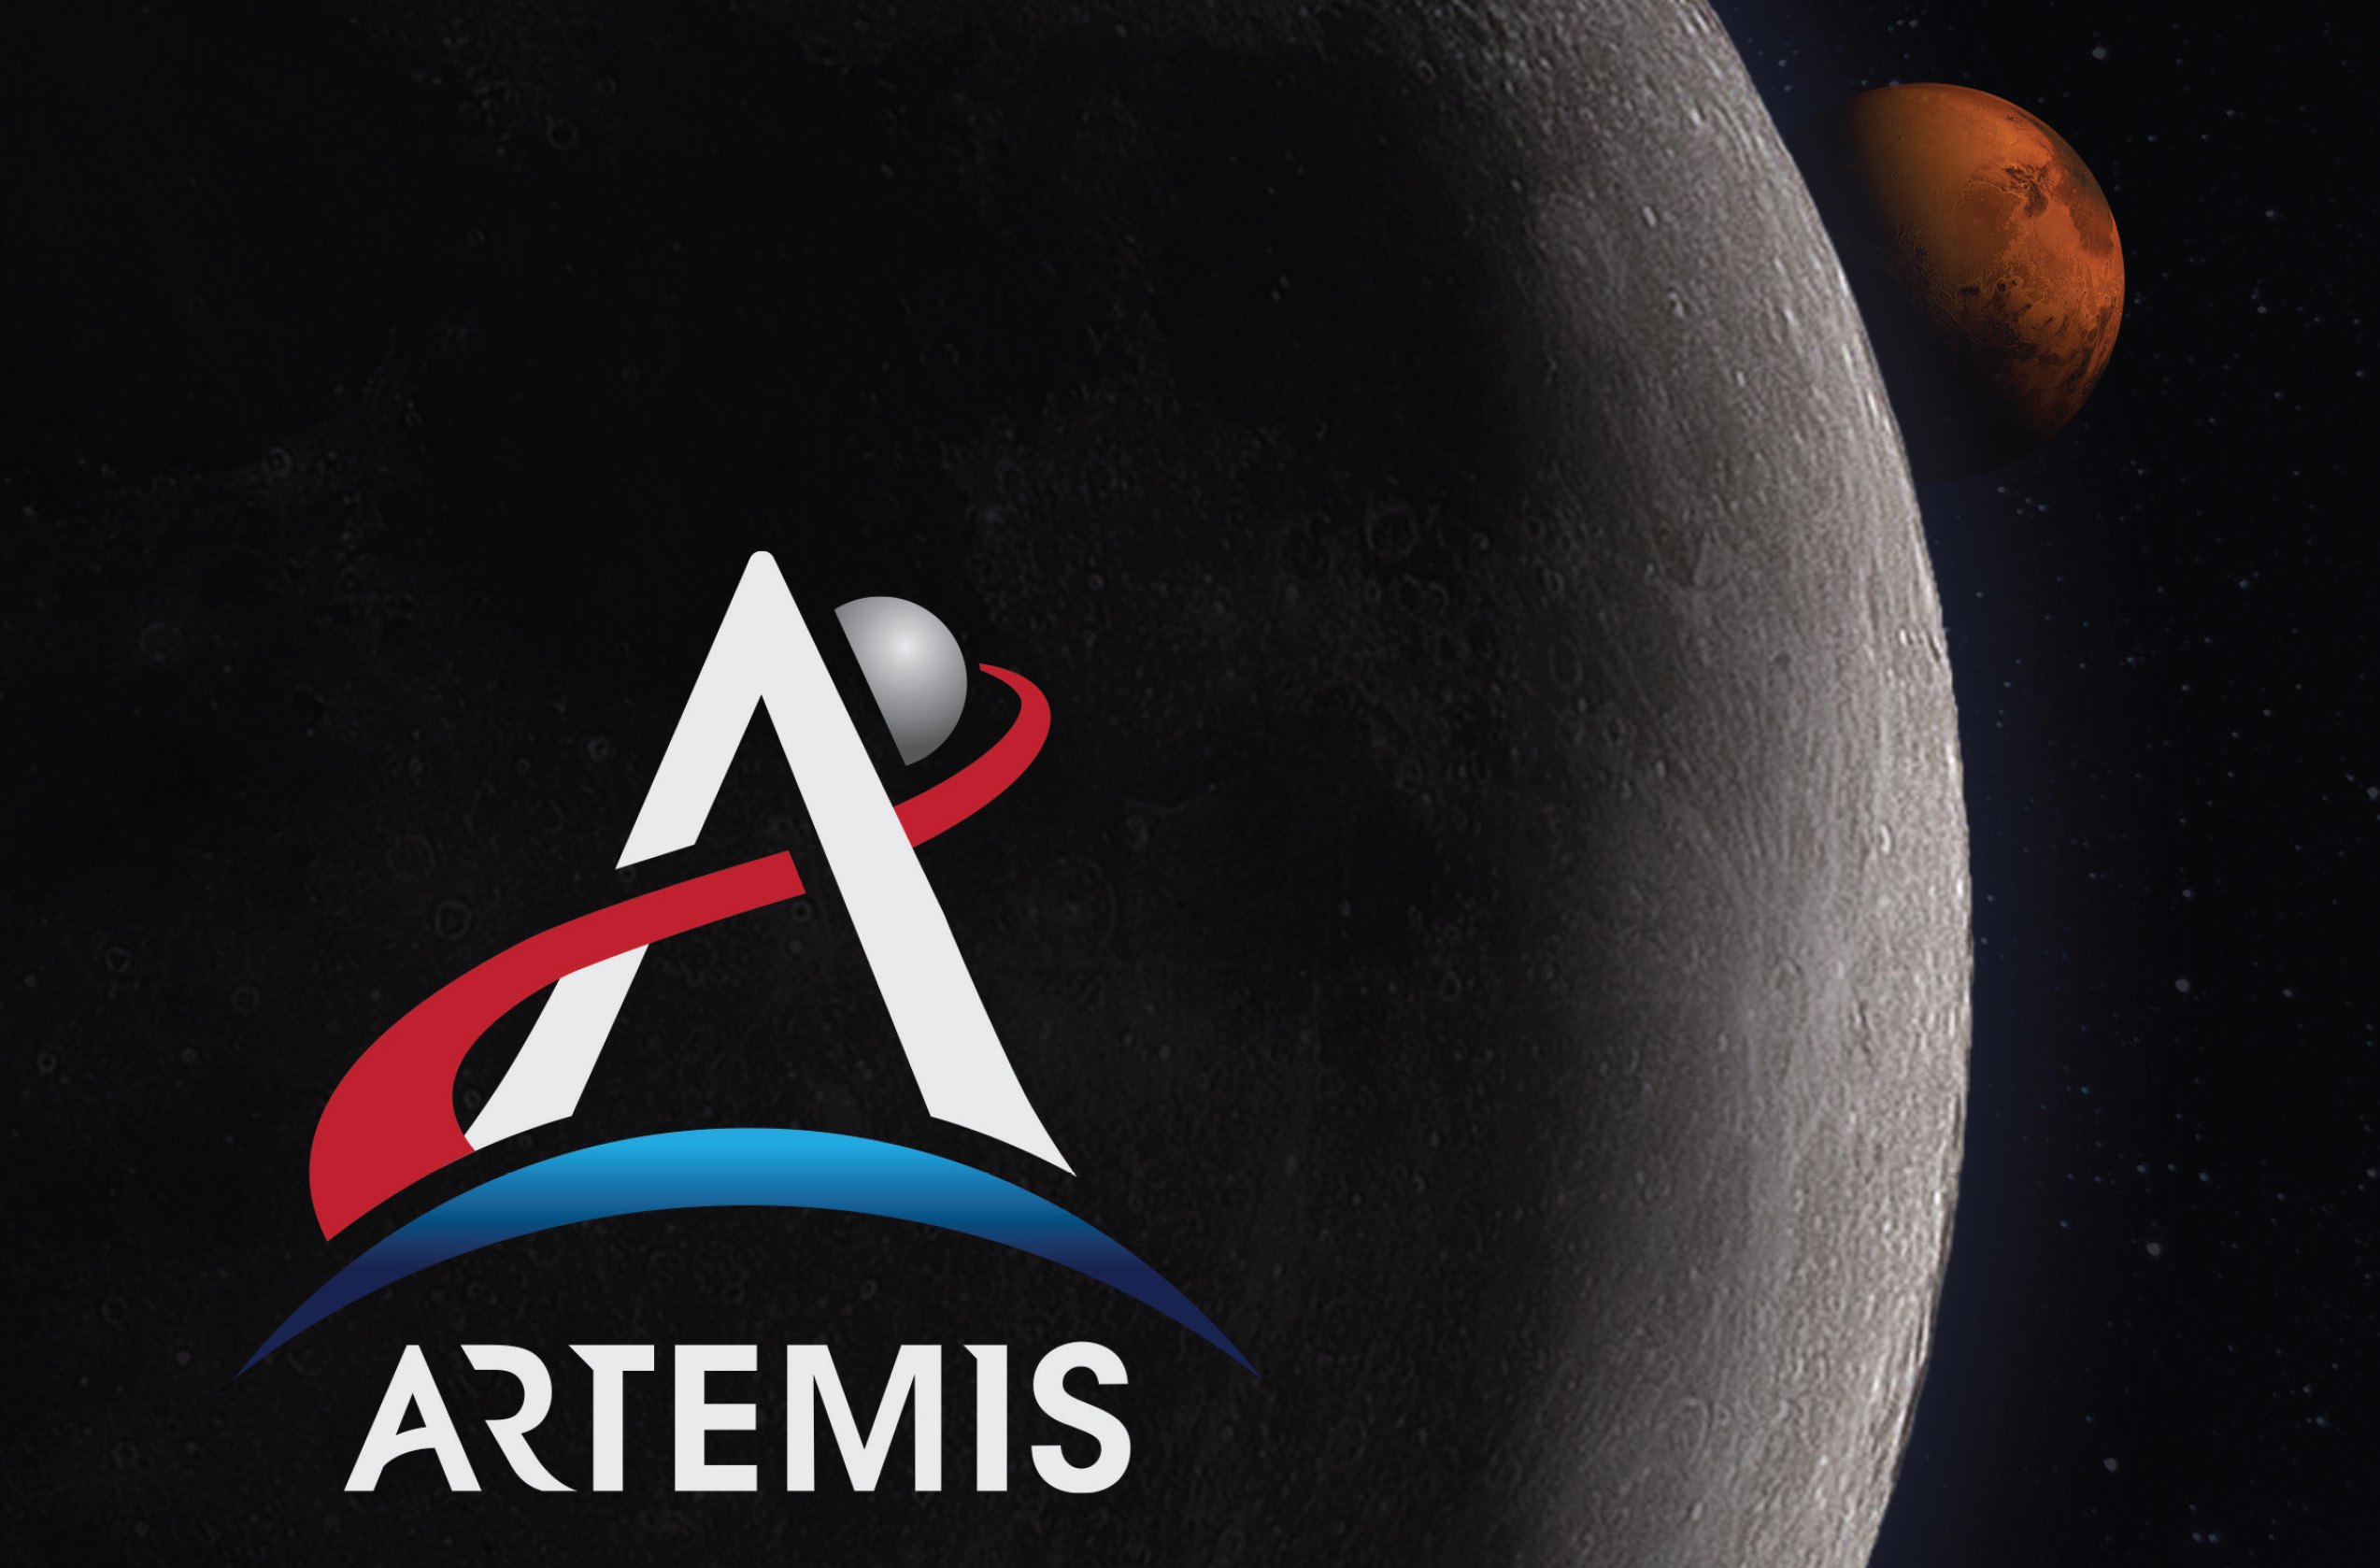 Image: NASA's Artemis Logo and Identity